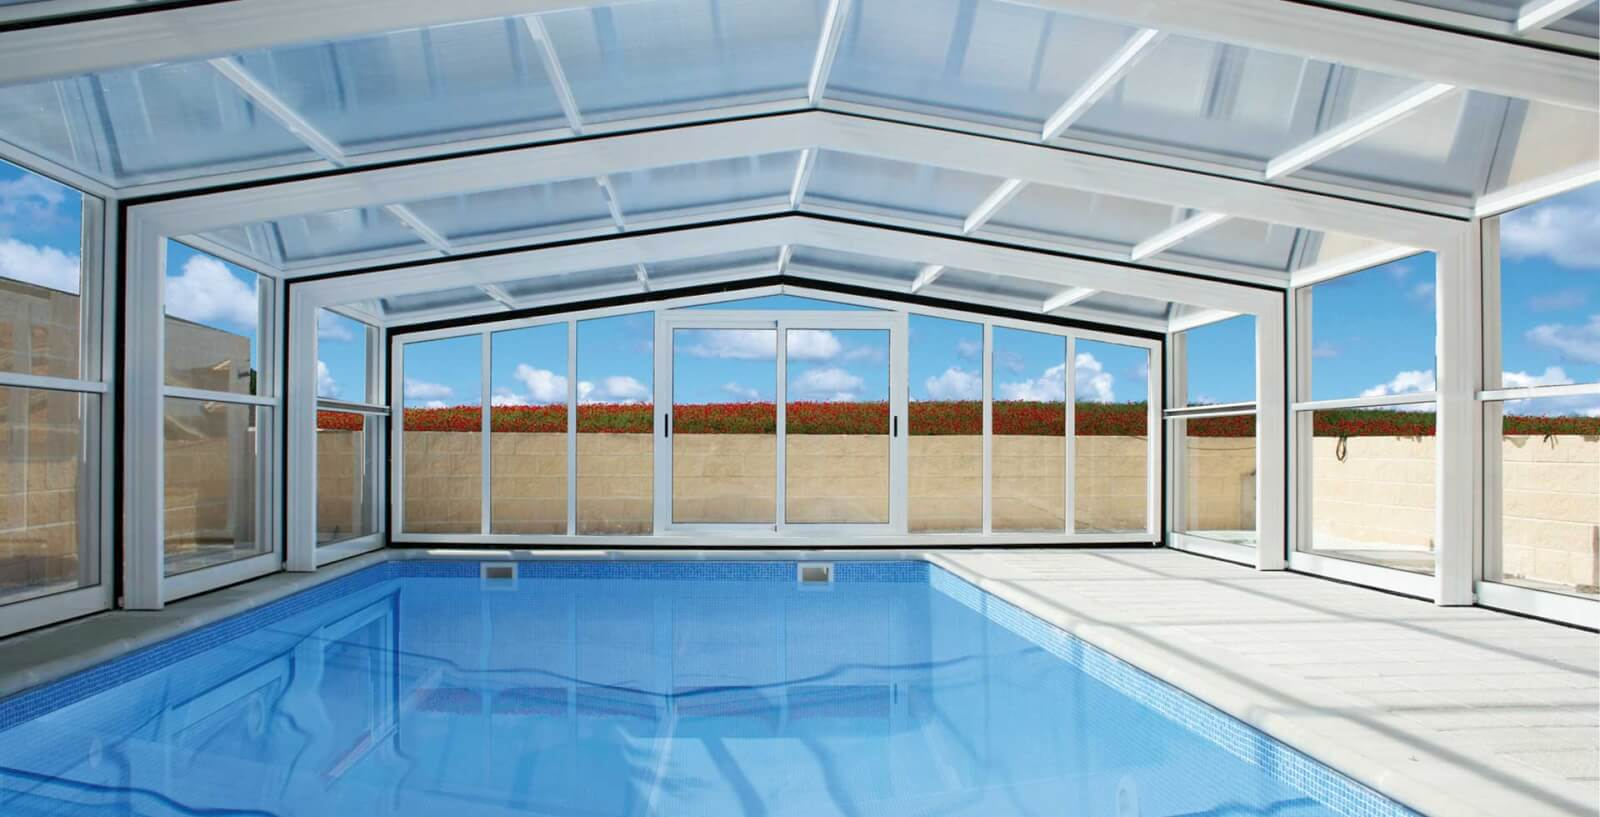 Cubierta de piscinas policarbonato modelo izalco tecnyban for Cubiertas acristaladas